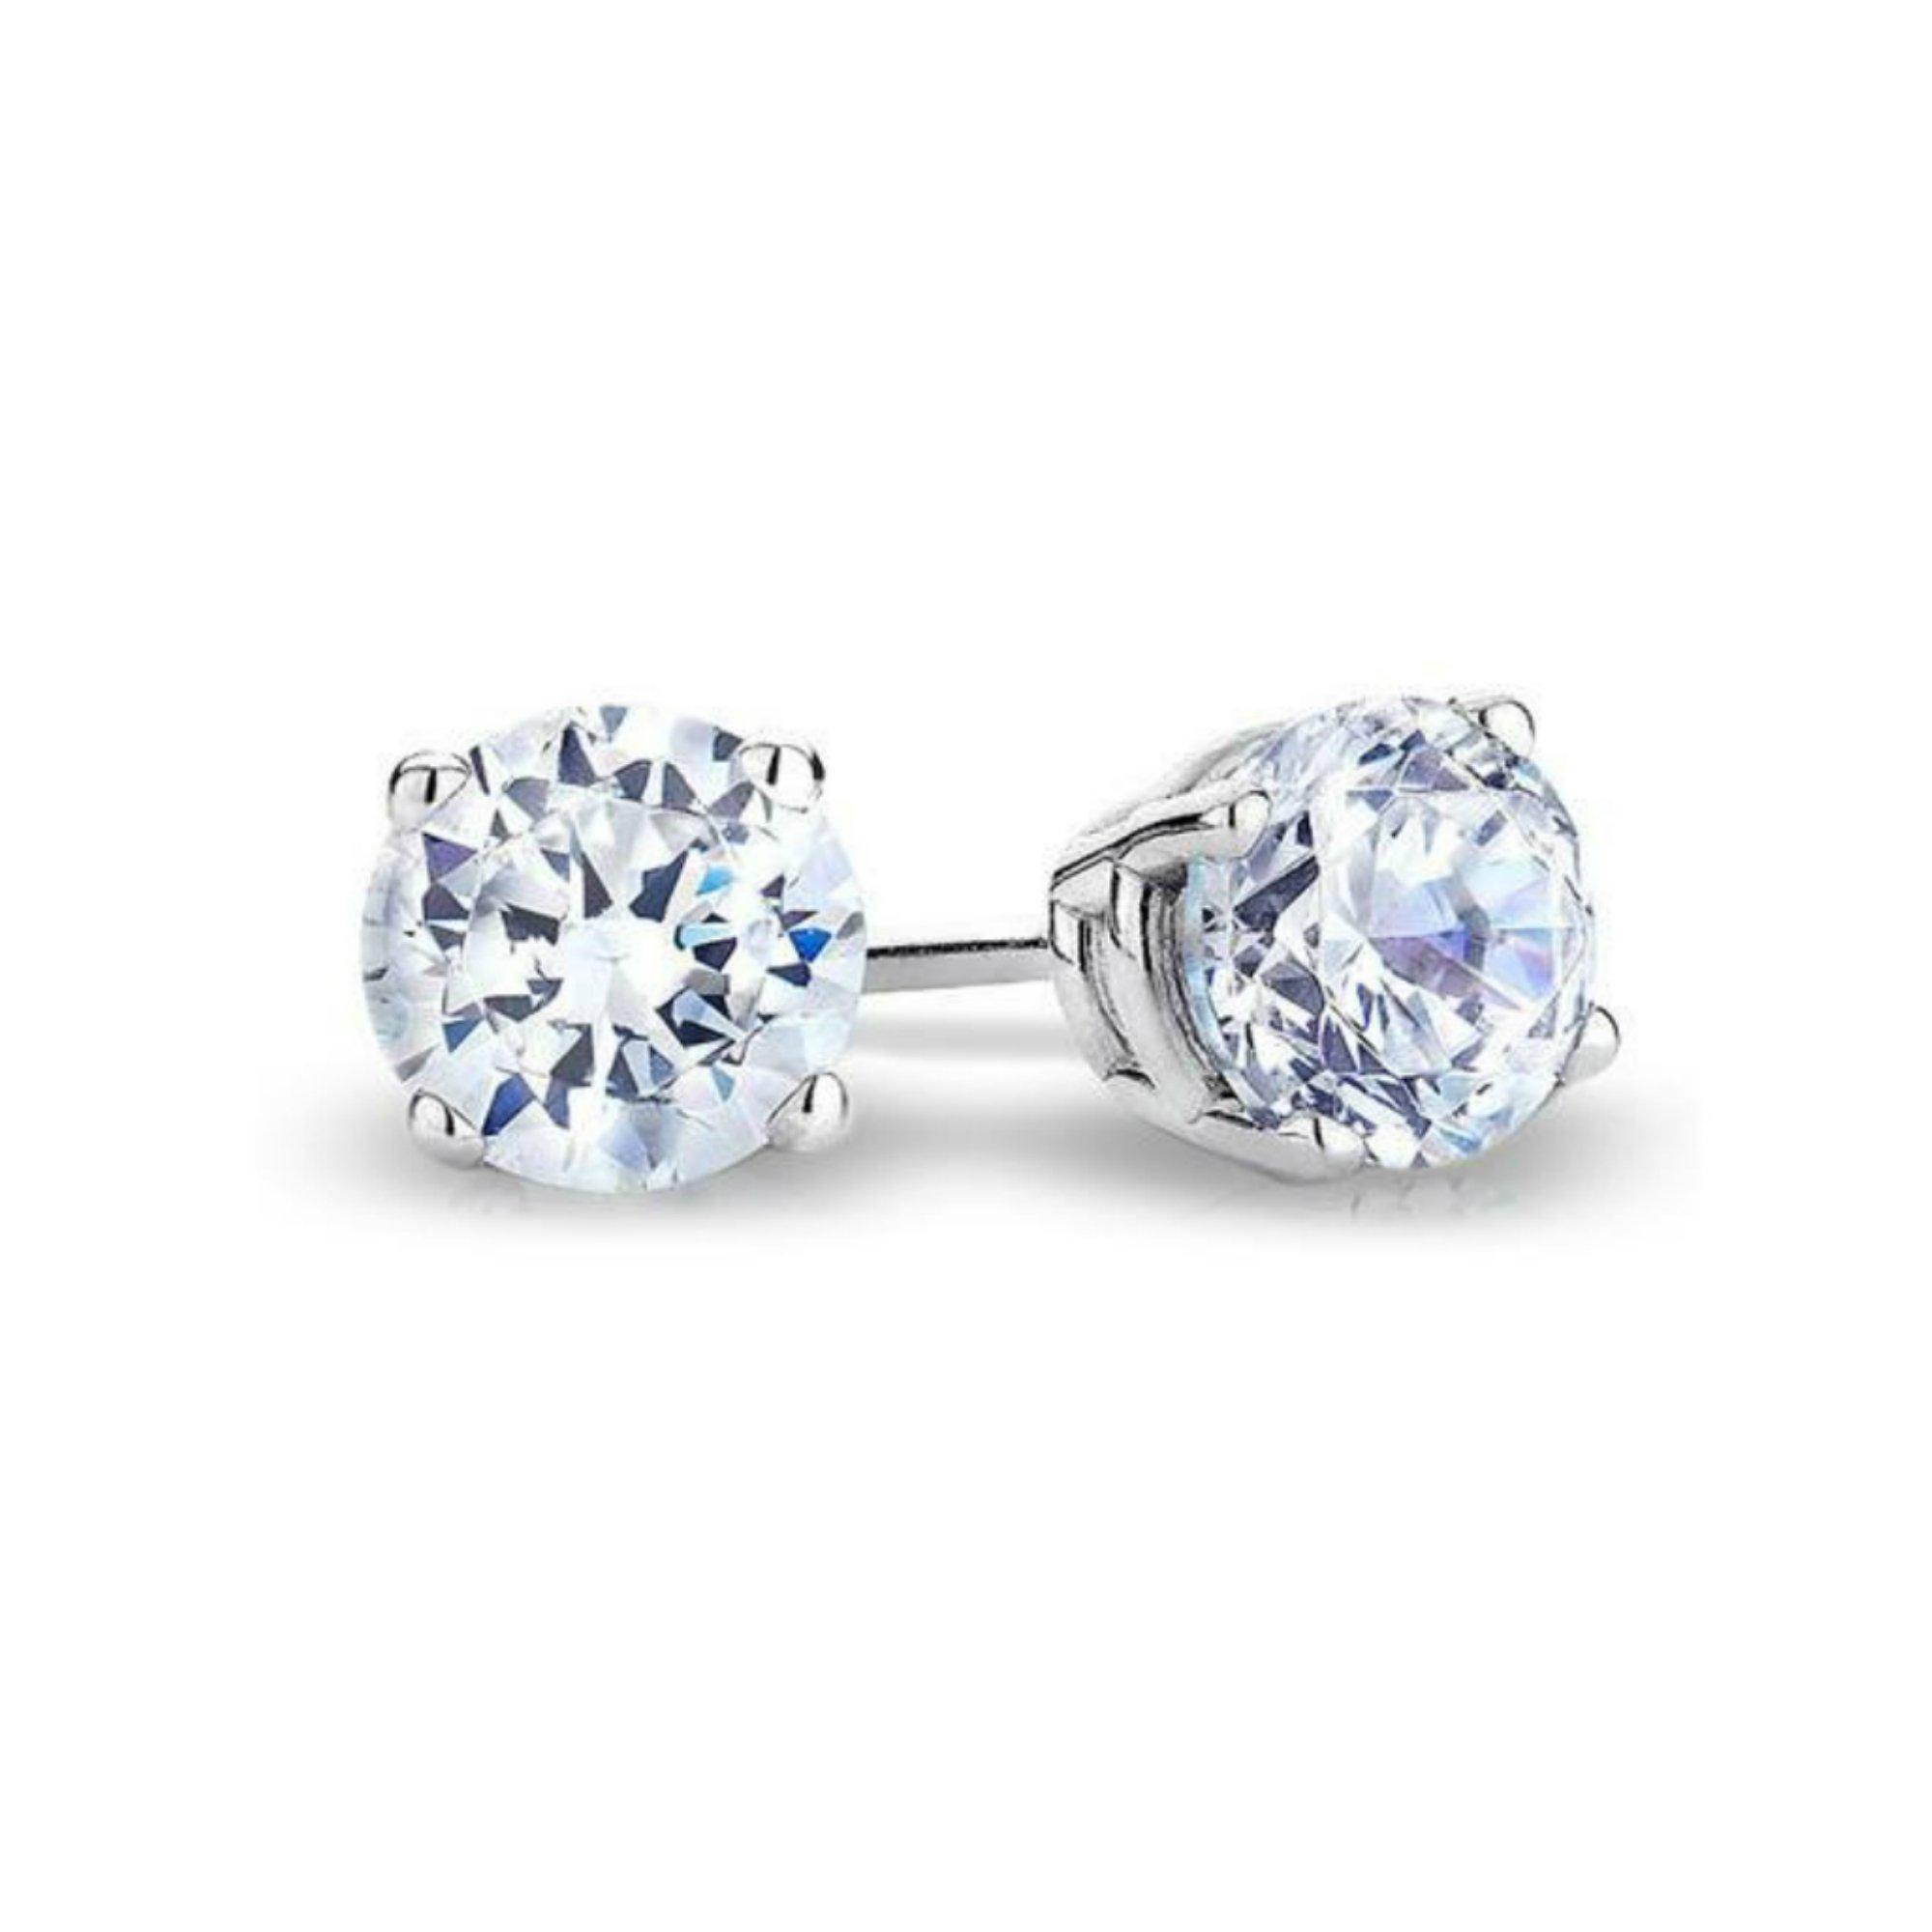 Sale! IGI Certified Solitaire 14k White Gold Diamond Stud Earrings (Divine) (Clarity I1 I2, Color- HI) (0.40 cttw) by finediamondjewelry